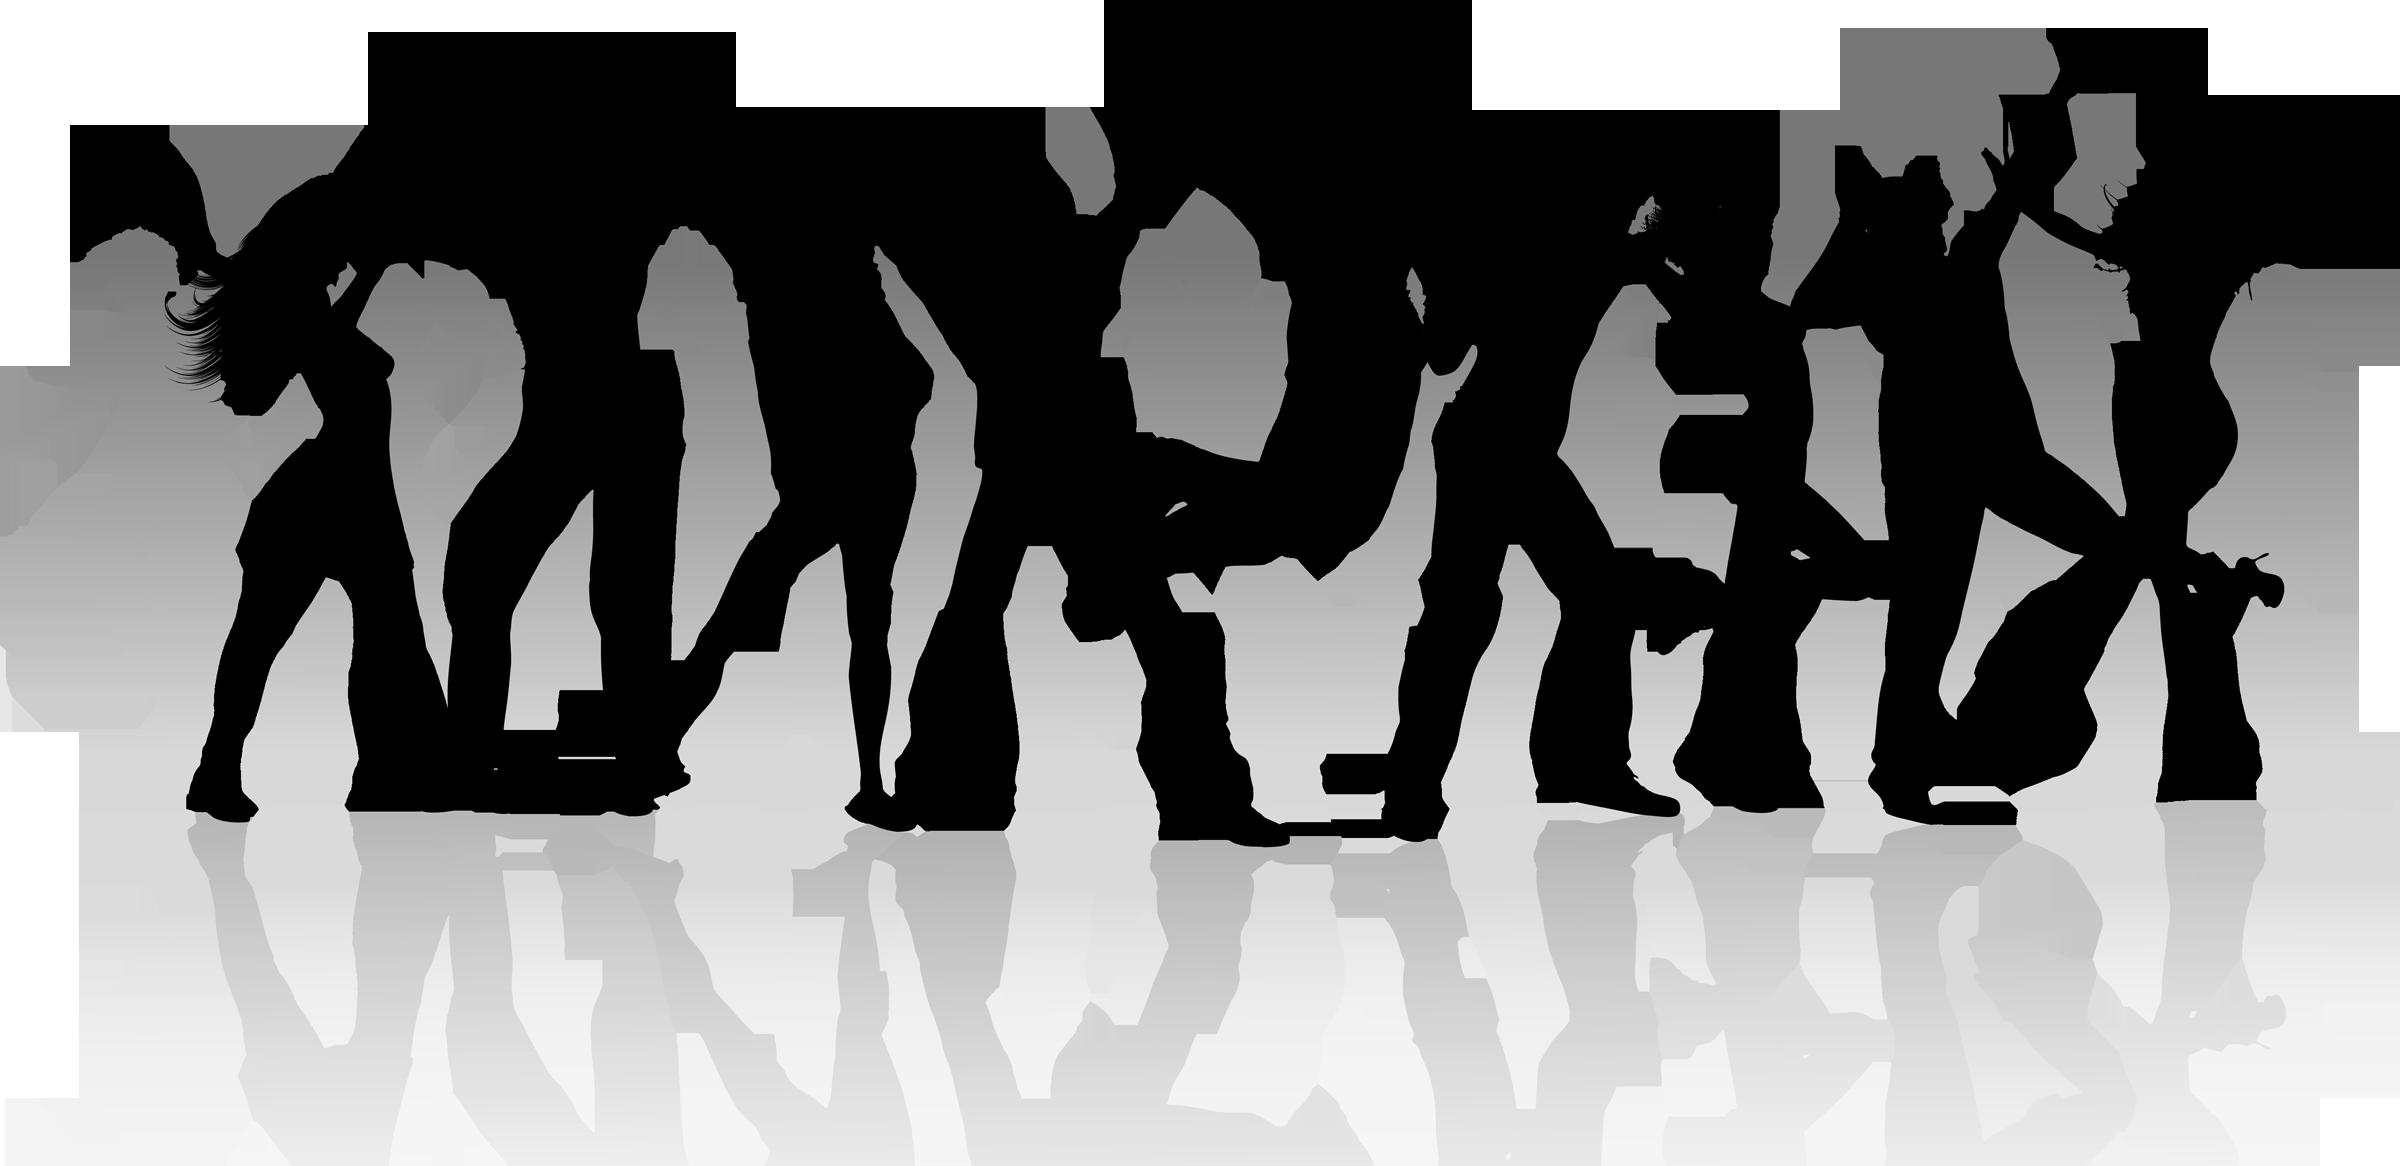 Group dance Silhouette Clip art.